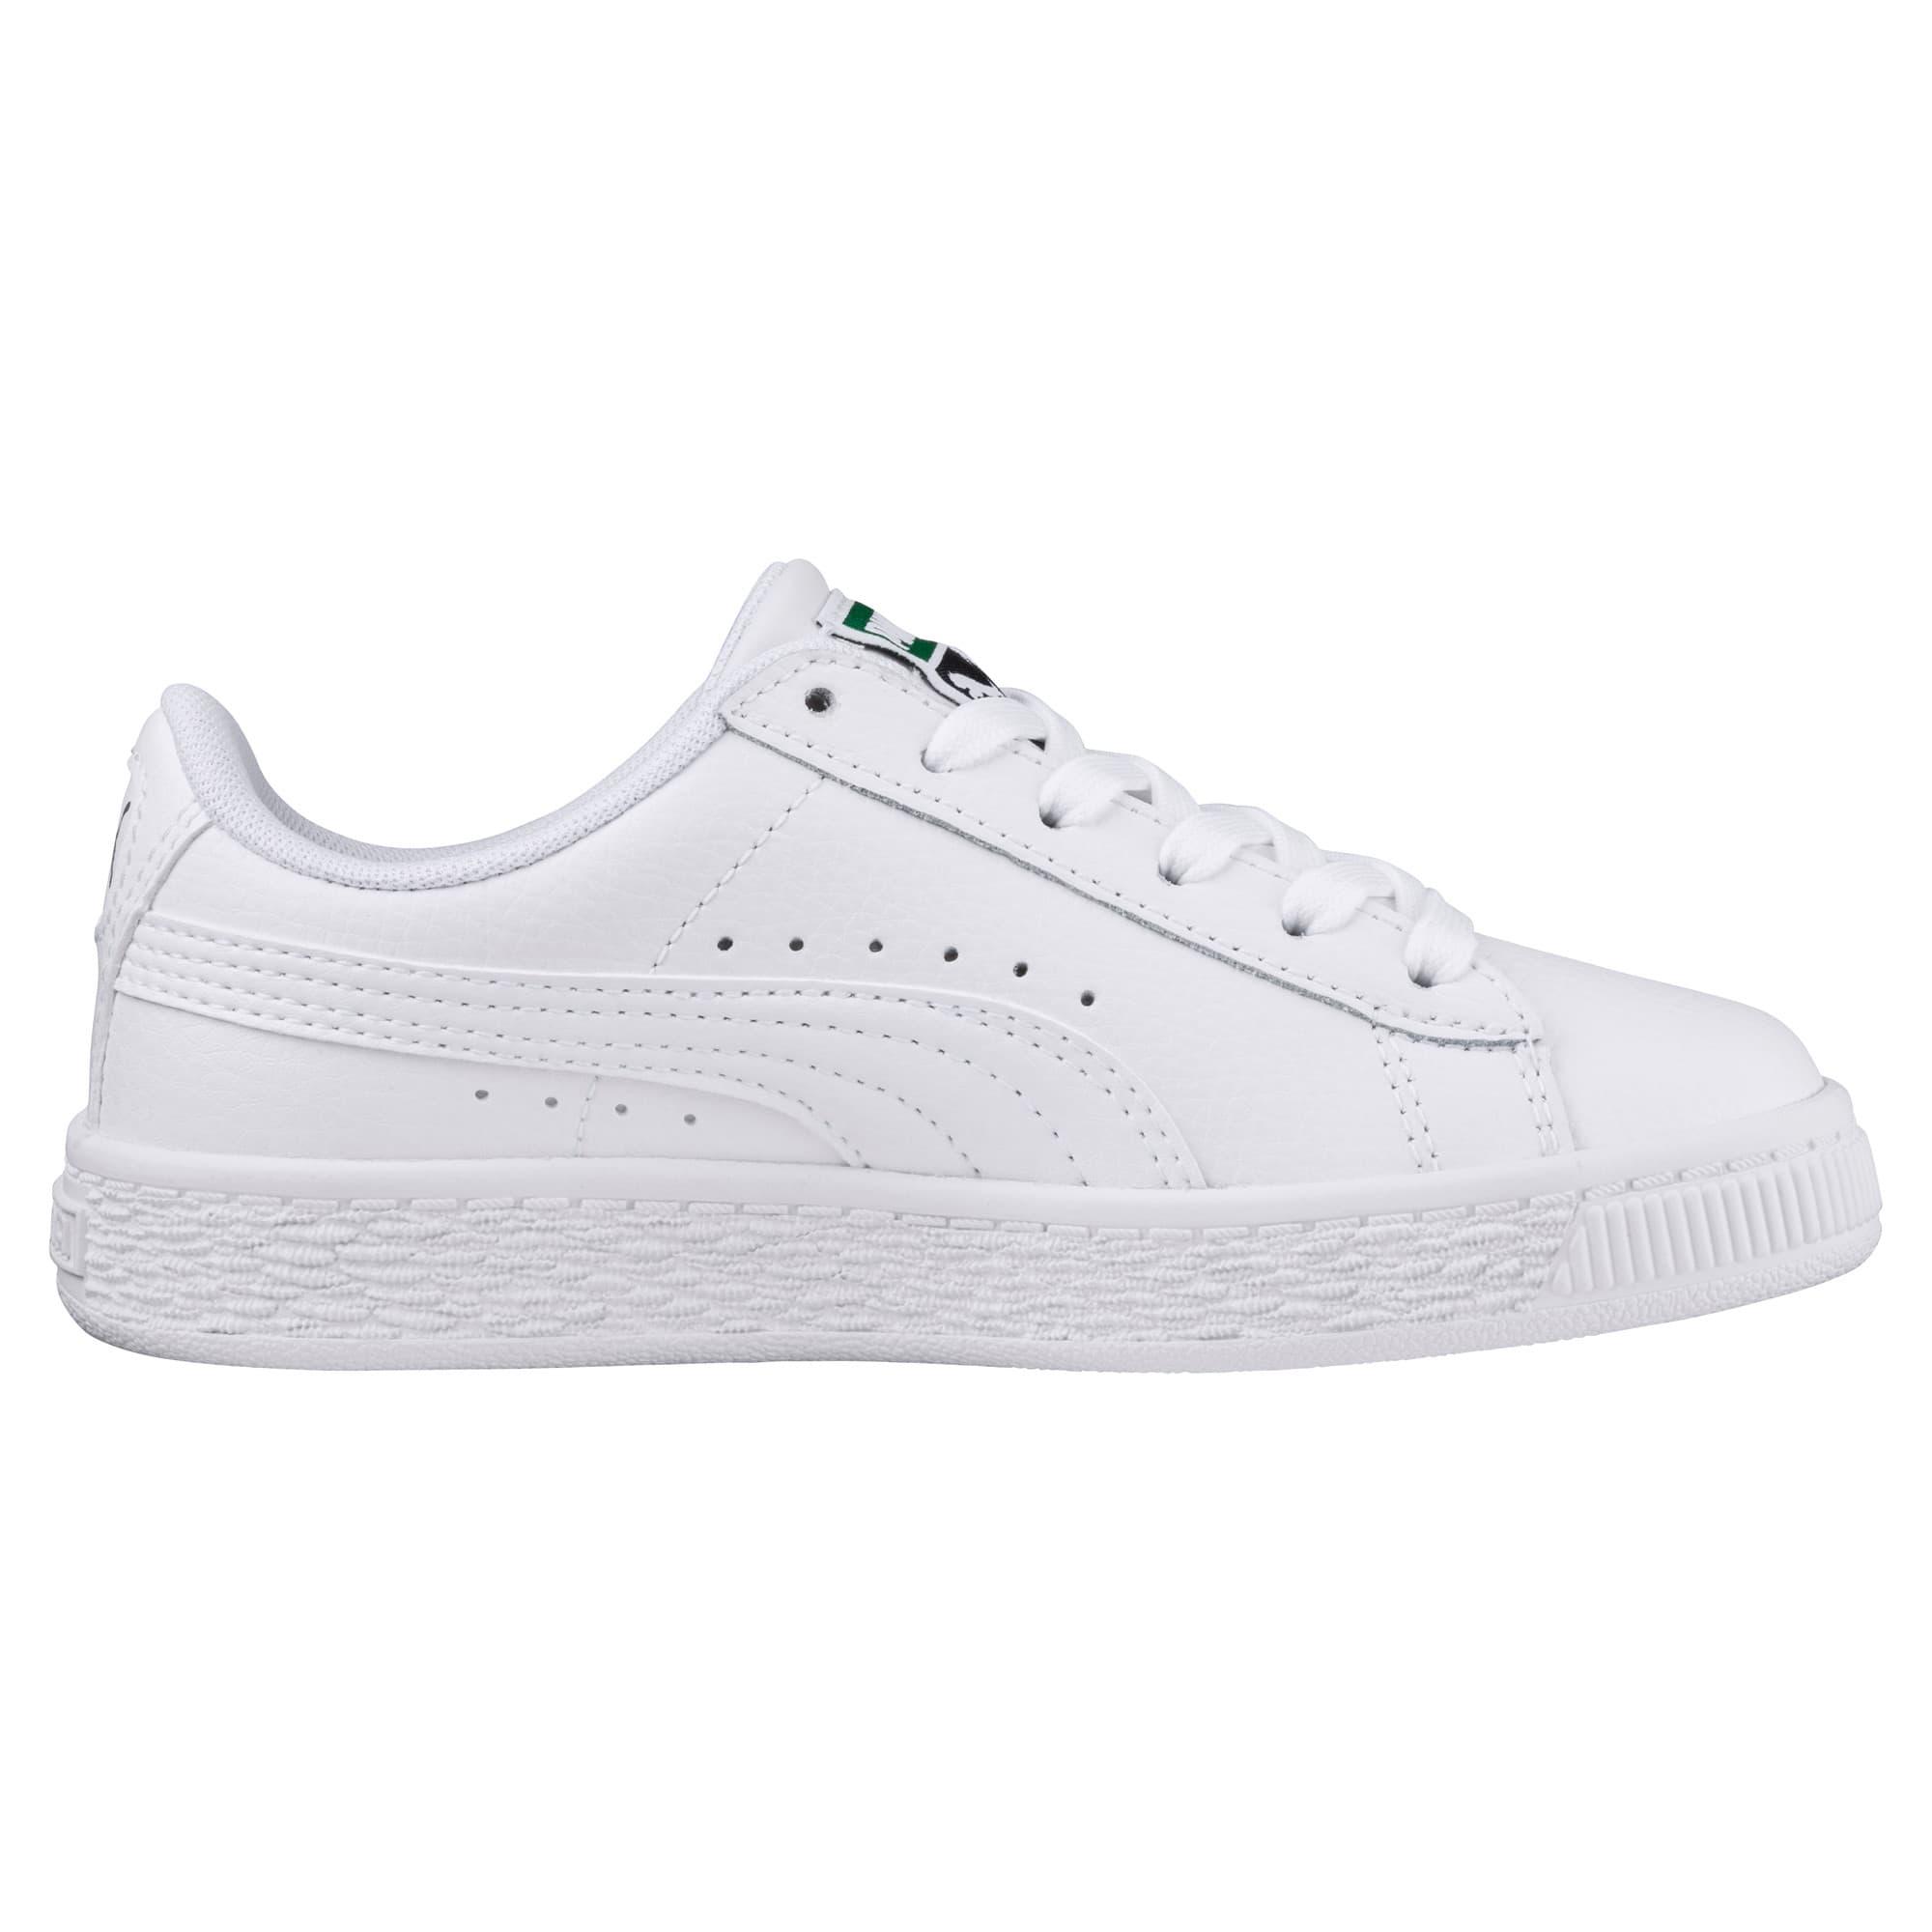 Thumbnail 4 of Basket Classic Little Kids' Shoes, Puma White-Puma White, medium